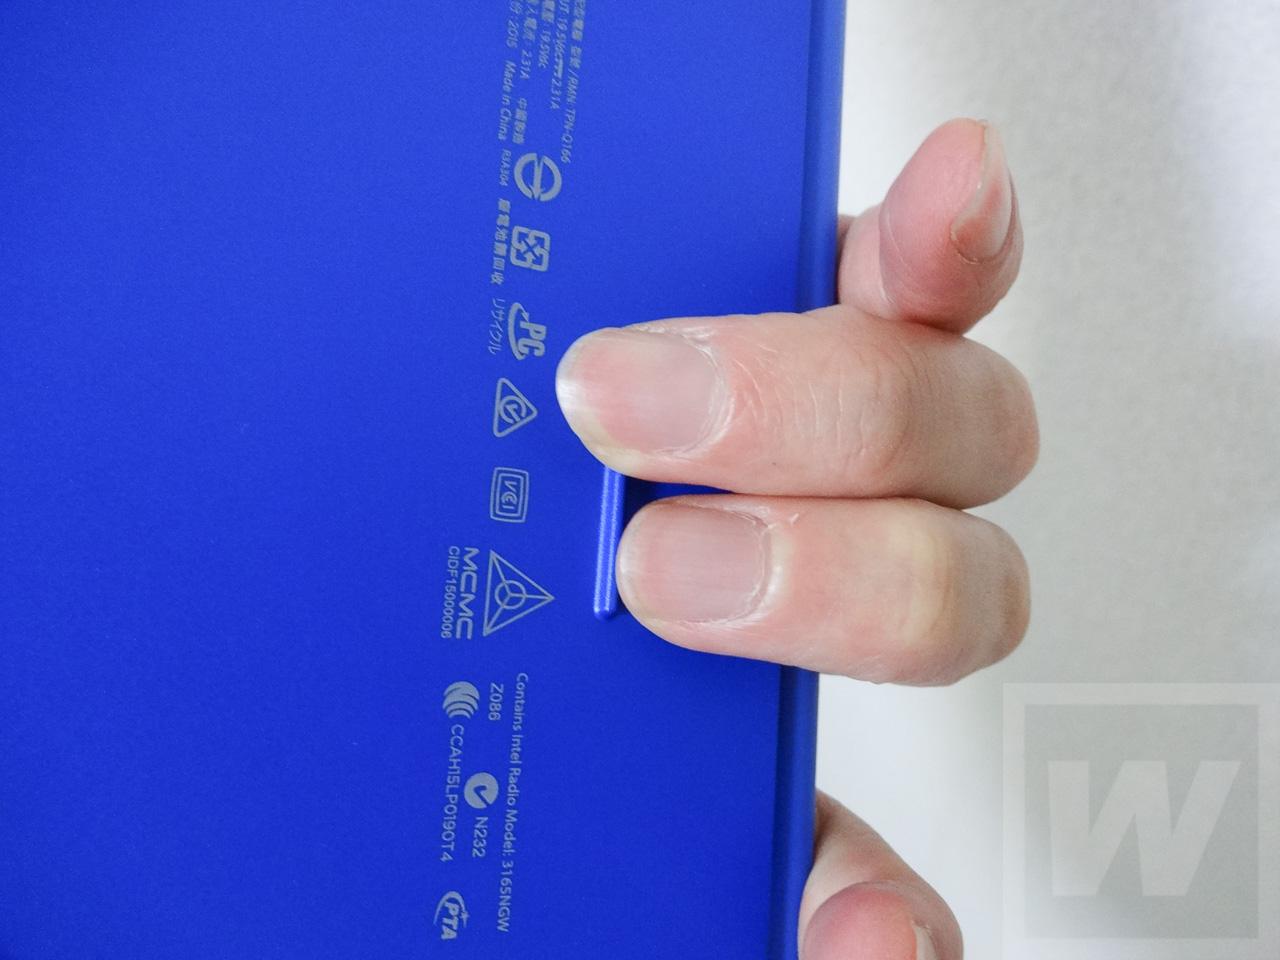 HP Stream 11-r000 (コバルトブルー) Review 001